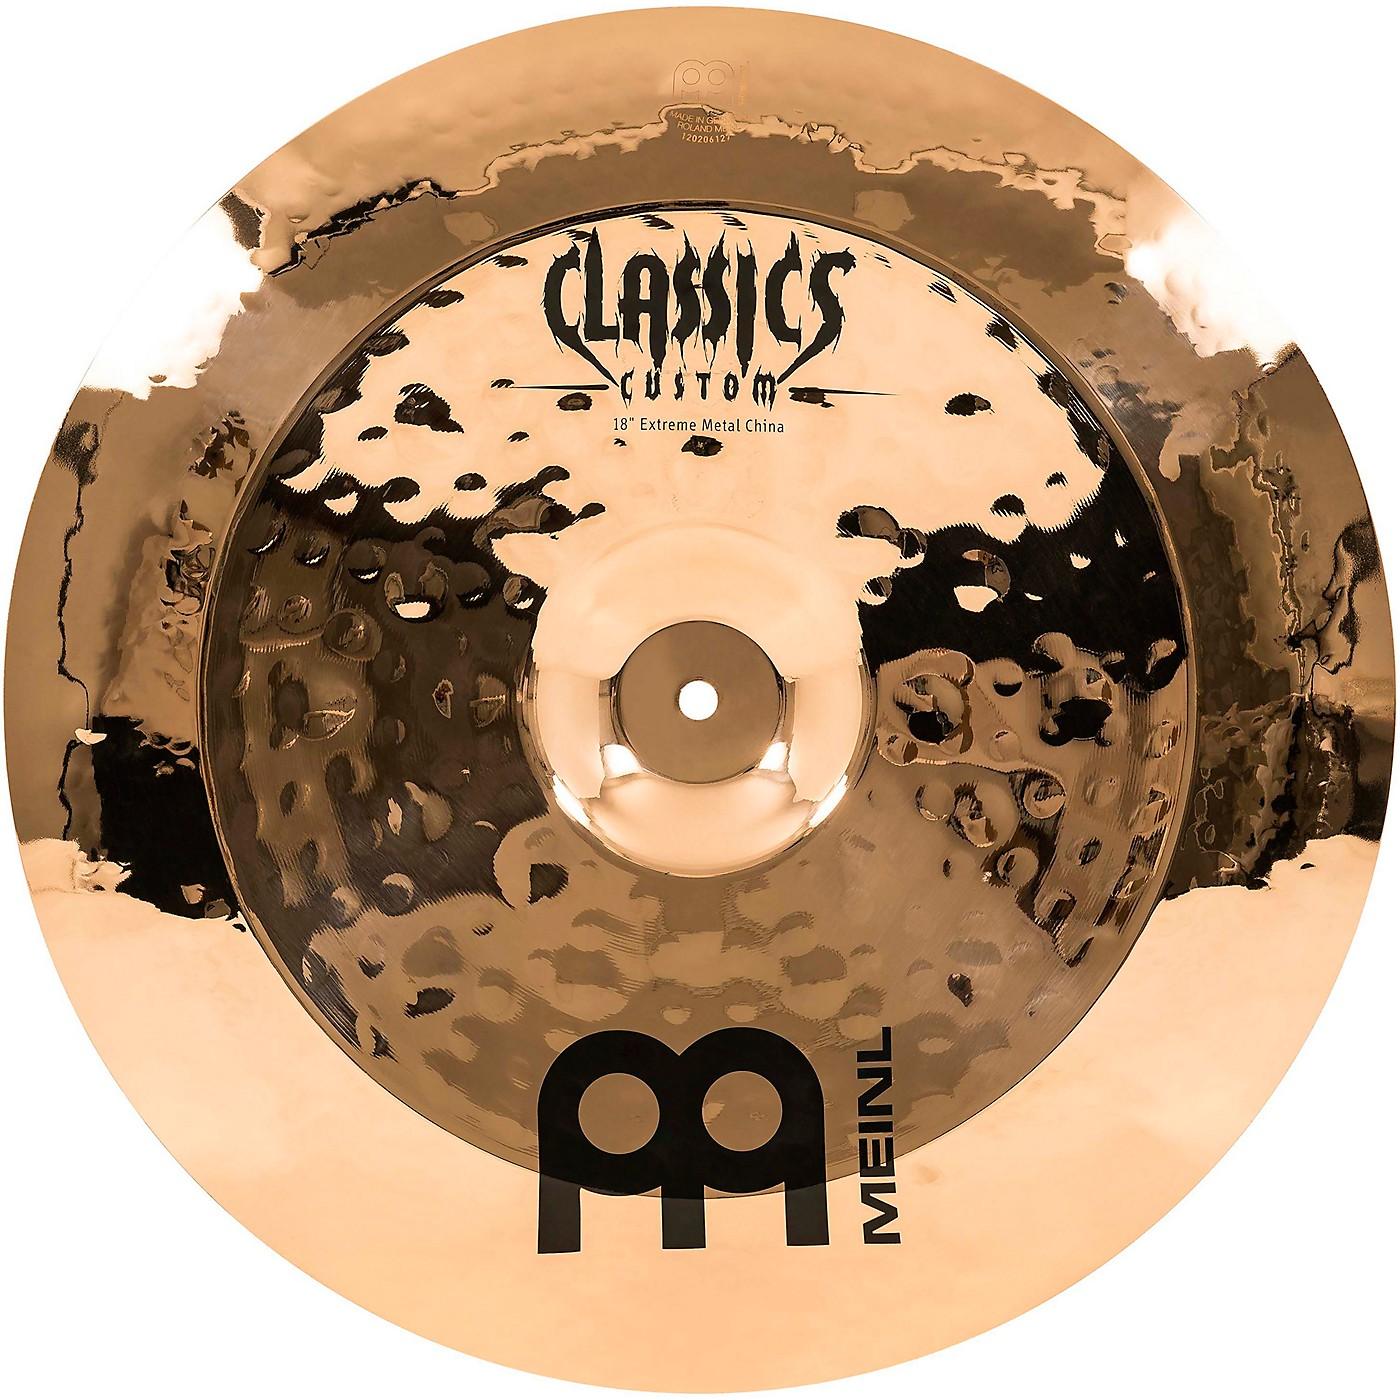 Meinl Classics Custom Extreme Metal China Cymbal thumbnail